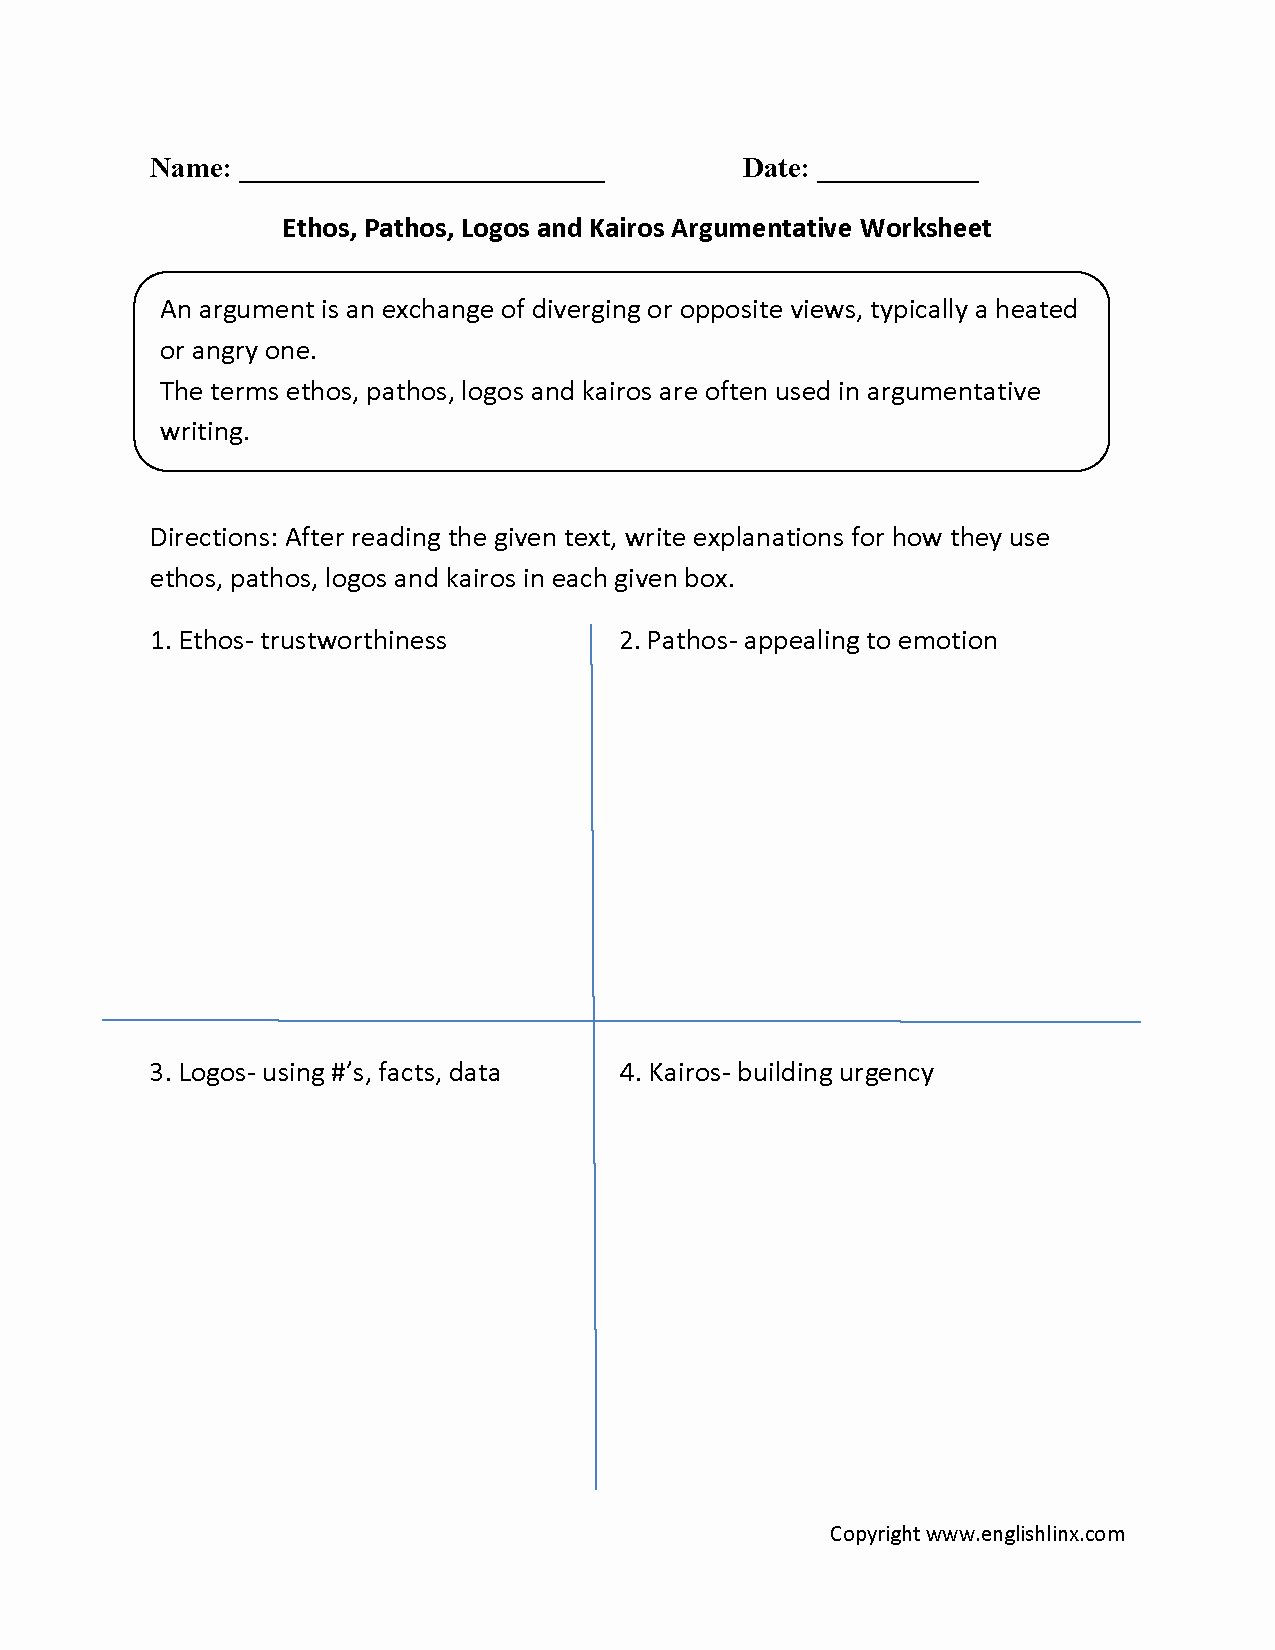 Ethos Pathos Logos Worksheet 50 Ethos Pathos Logos Worksheet Answers In 2020